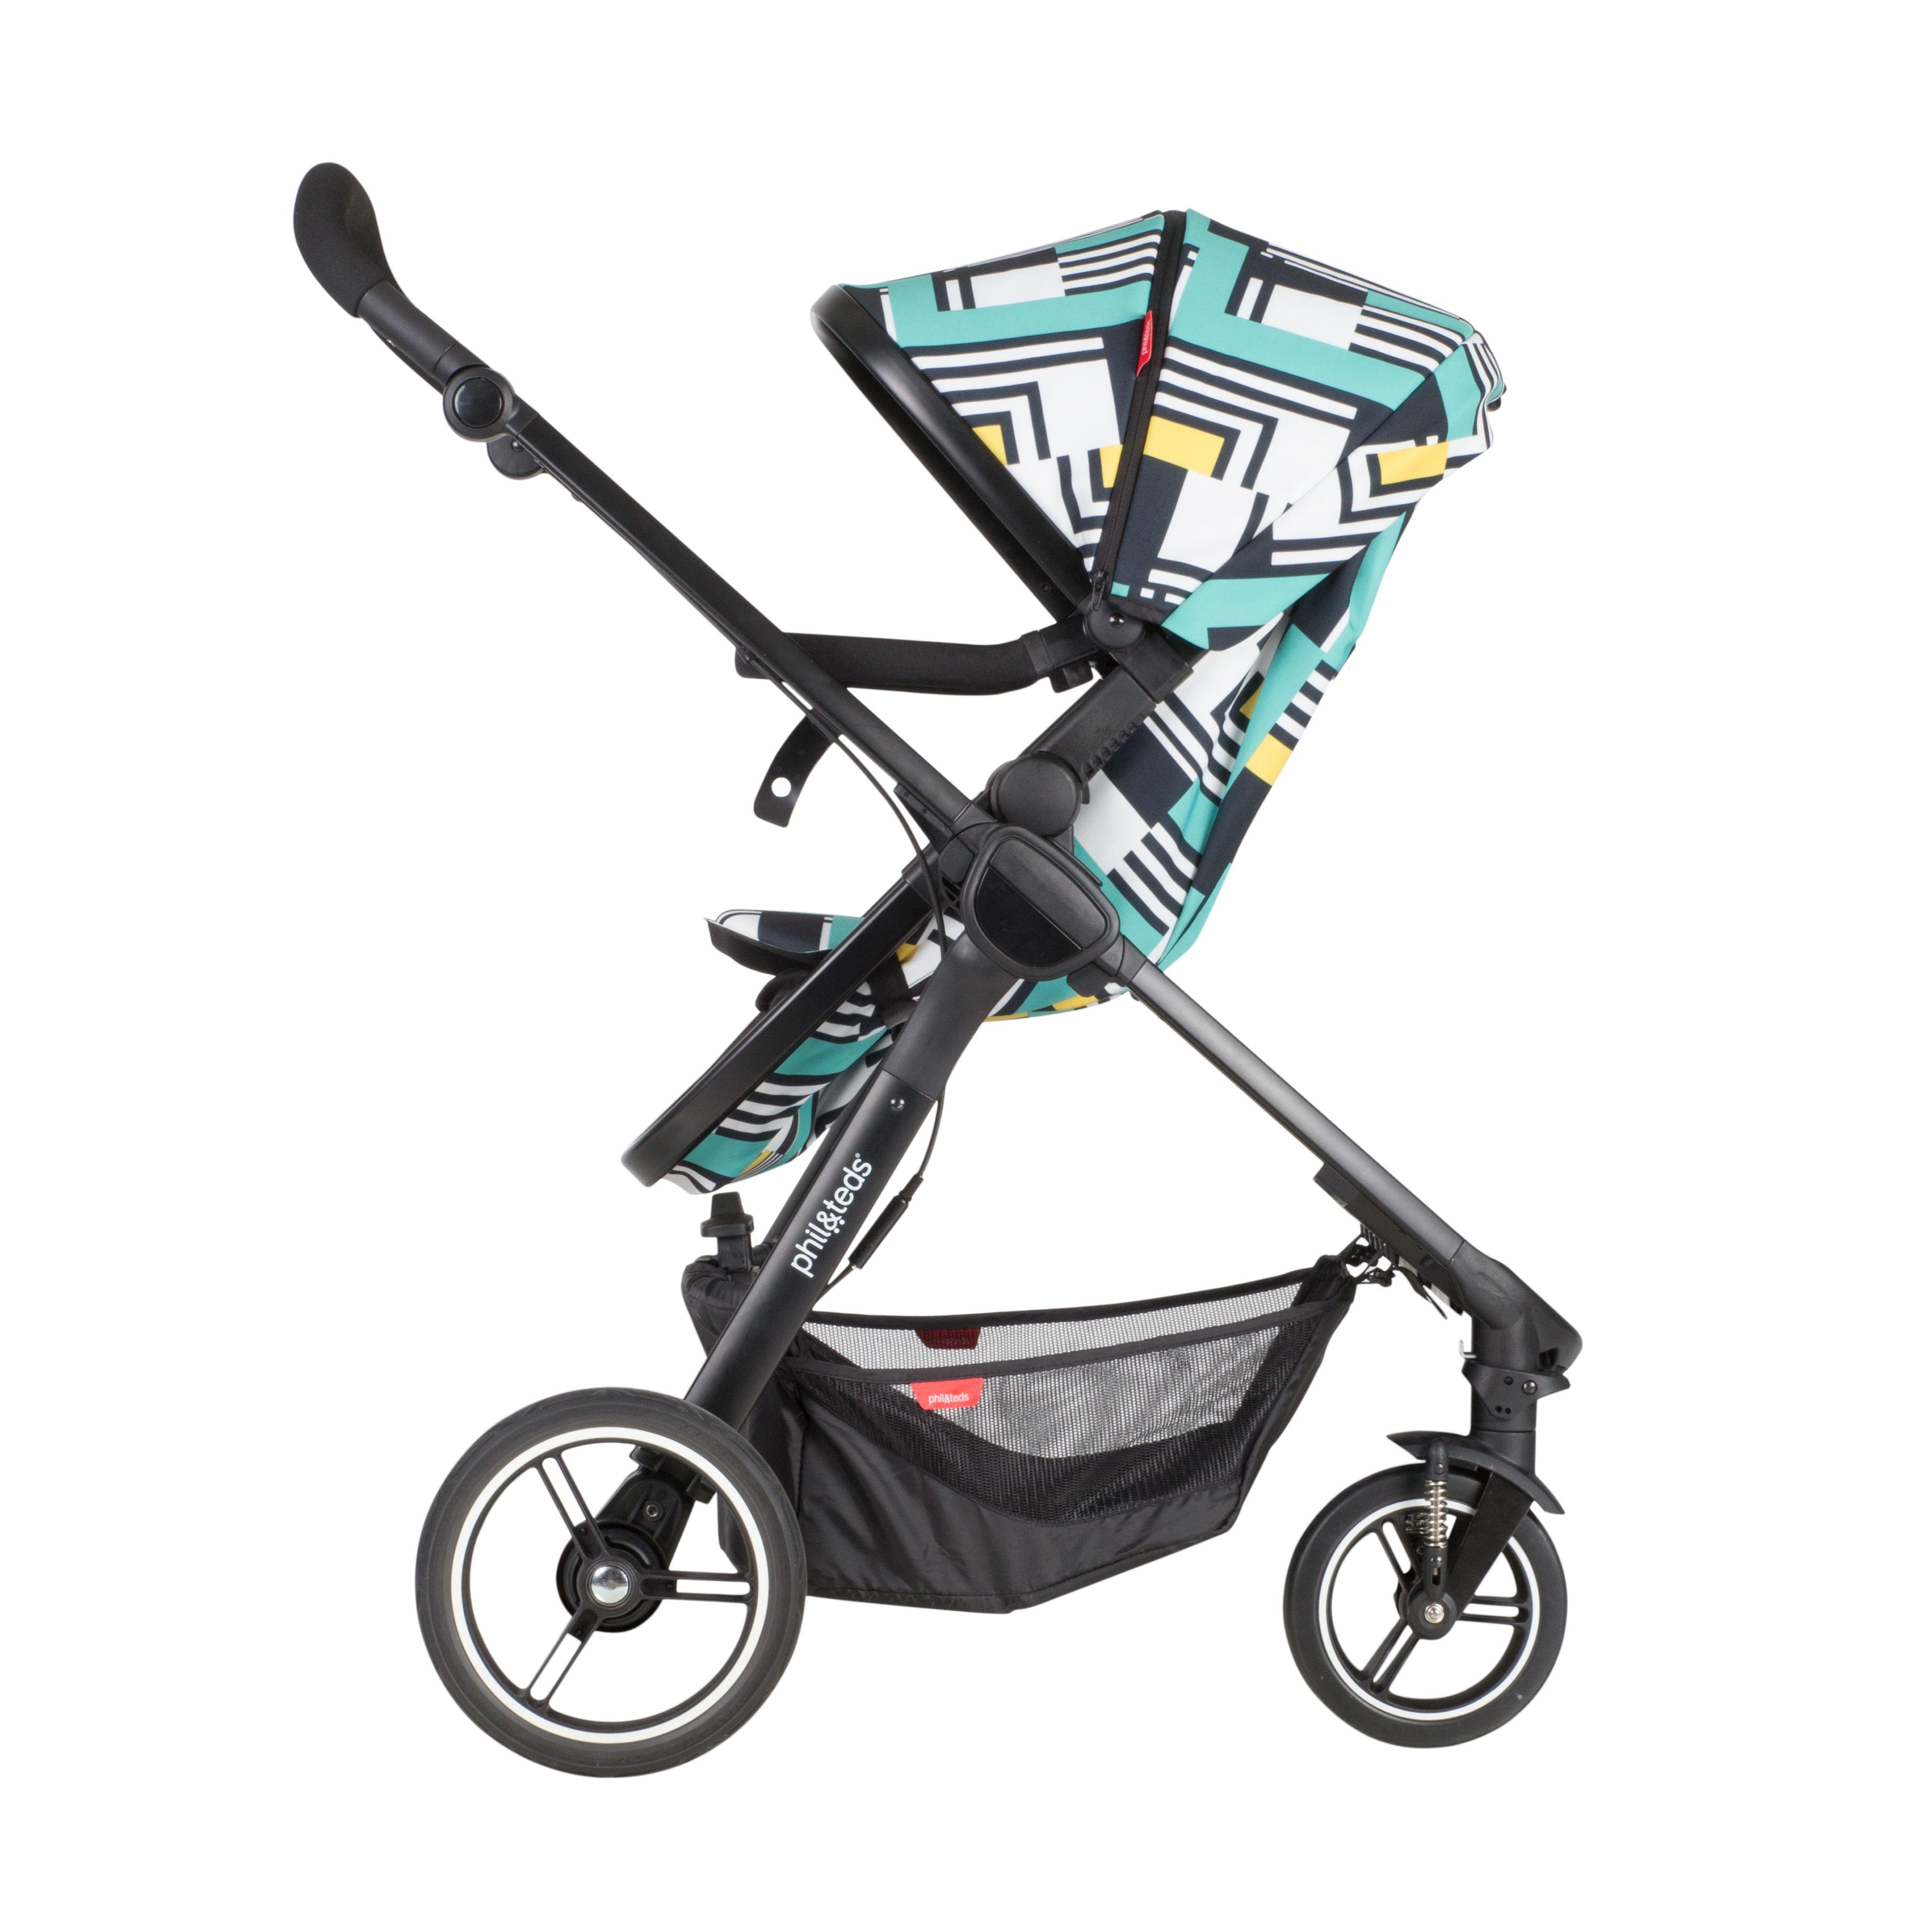 philteds mod stroller with in modular seat  mod stroller  - philteds mod stroller with in modular seat · baby loveshopbrandspramsstrollers